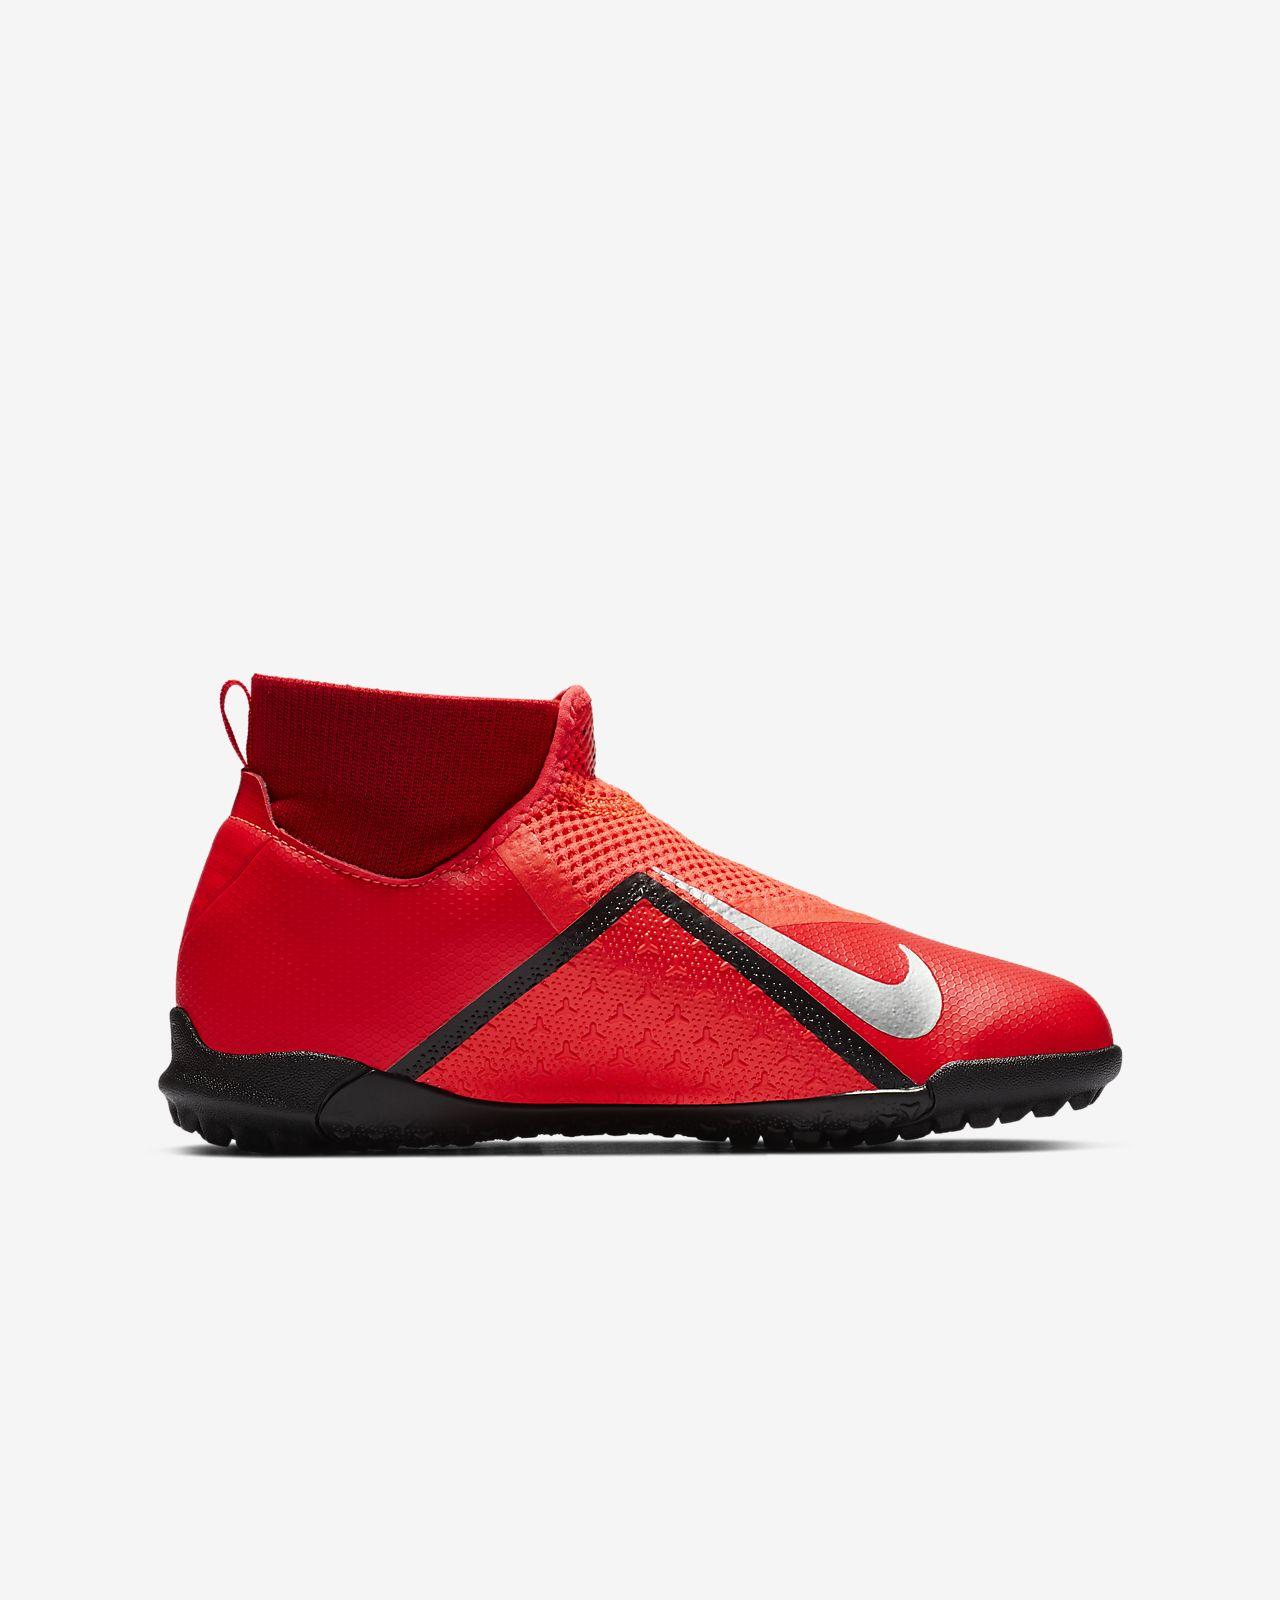 c6cb8463f4c4f ... Nike Jr. Phantom Vision Academy Dynamic Fit Botas de fútbol para  moqueta - Turf -